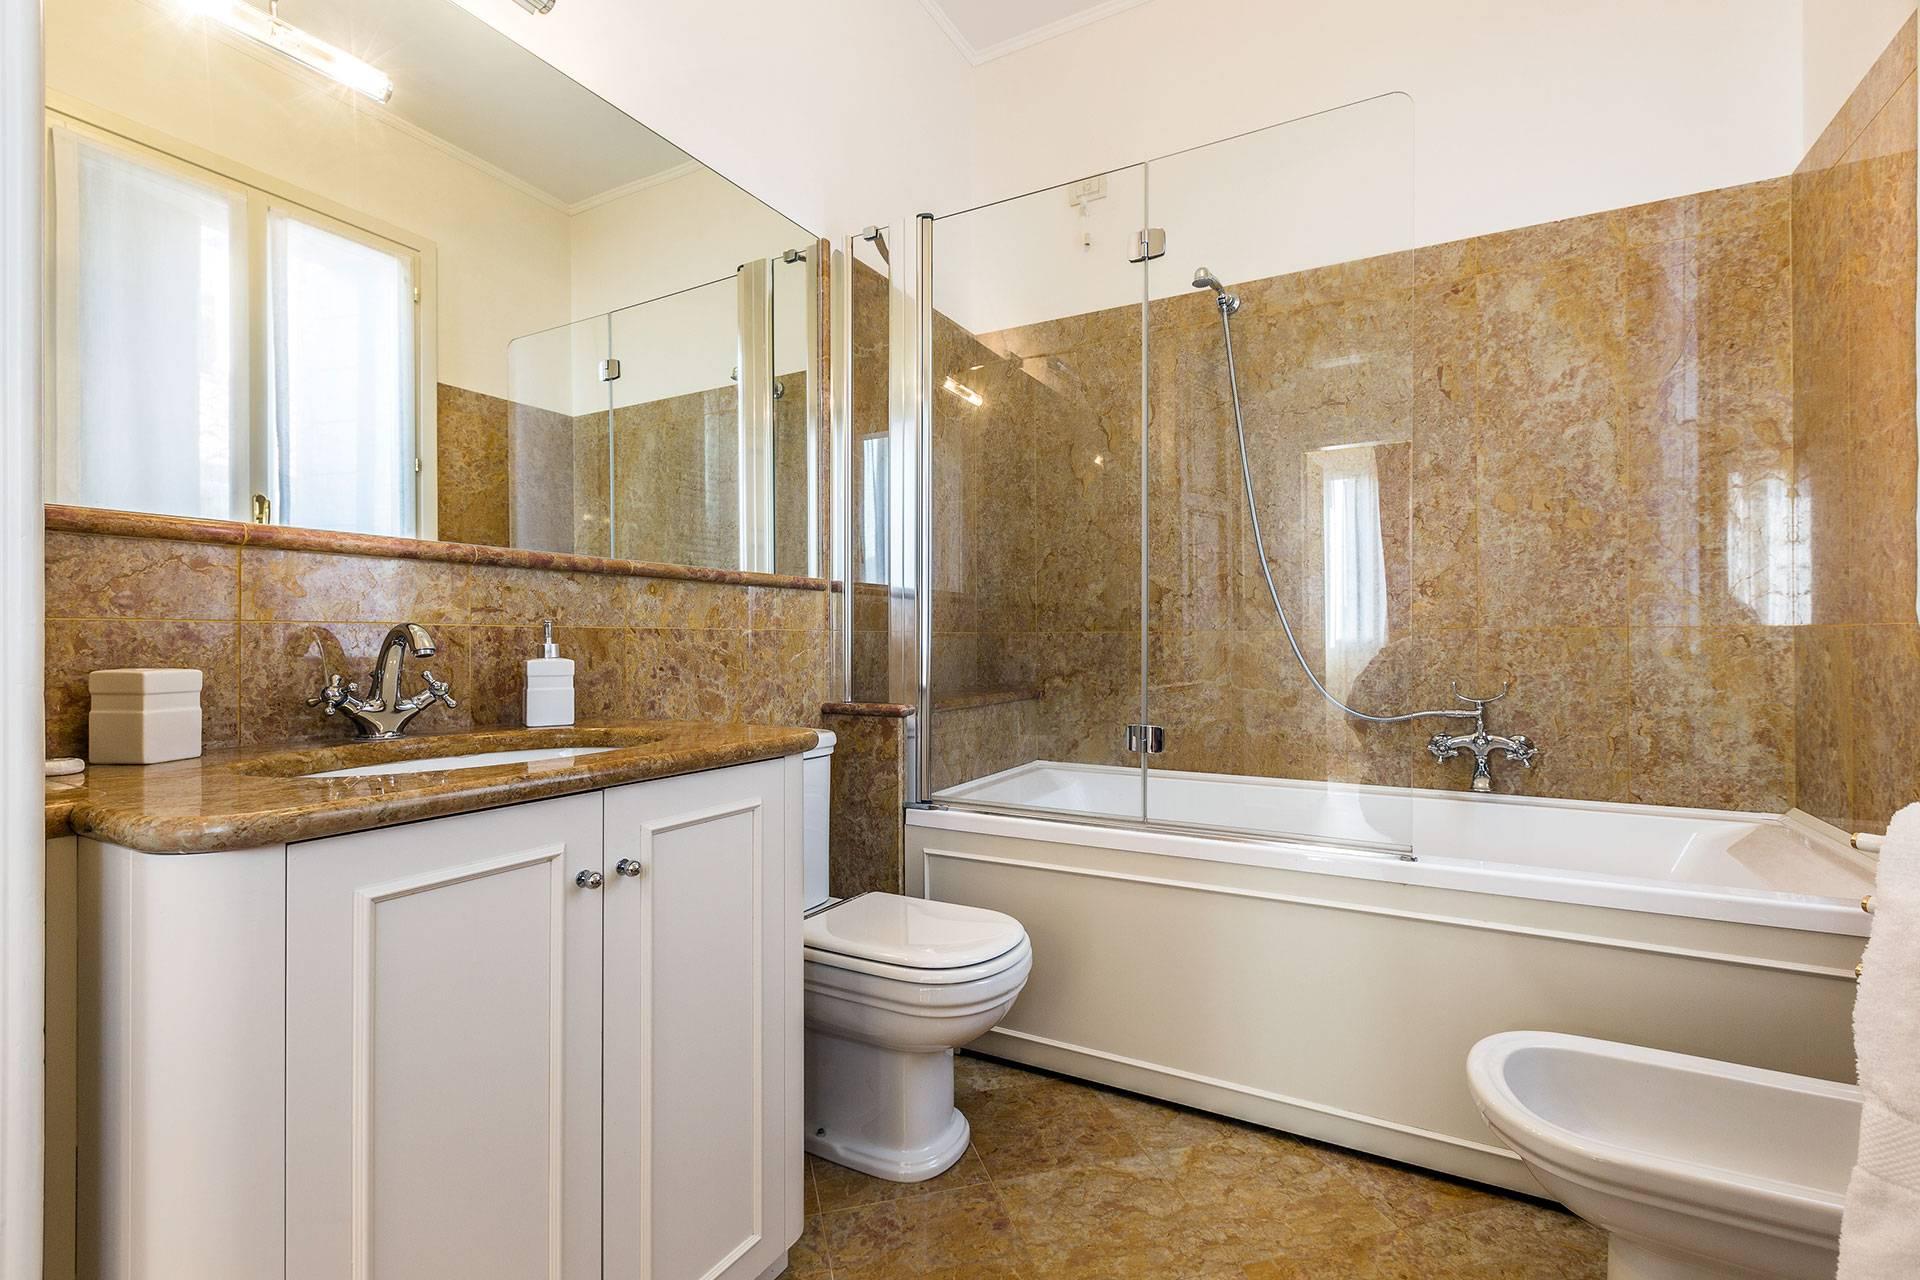 luxury en-suite bathroom with bathtub